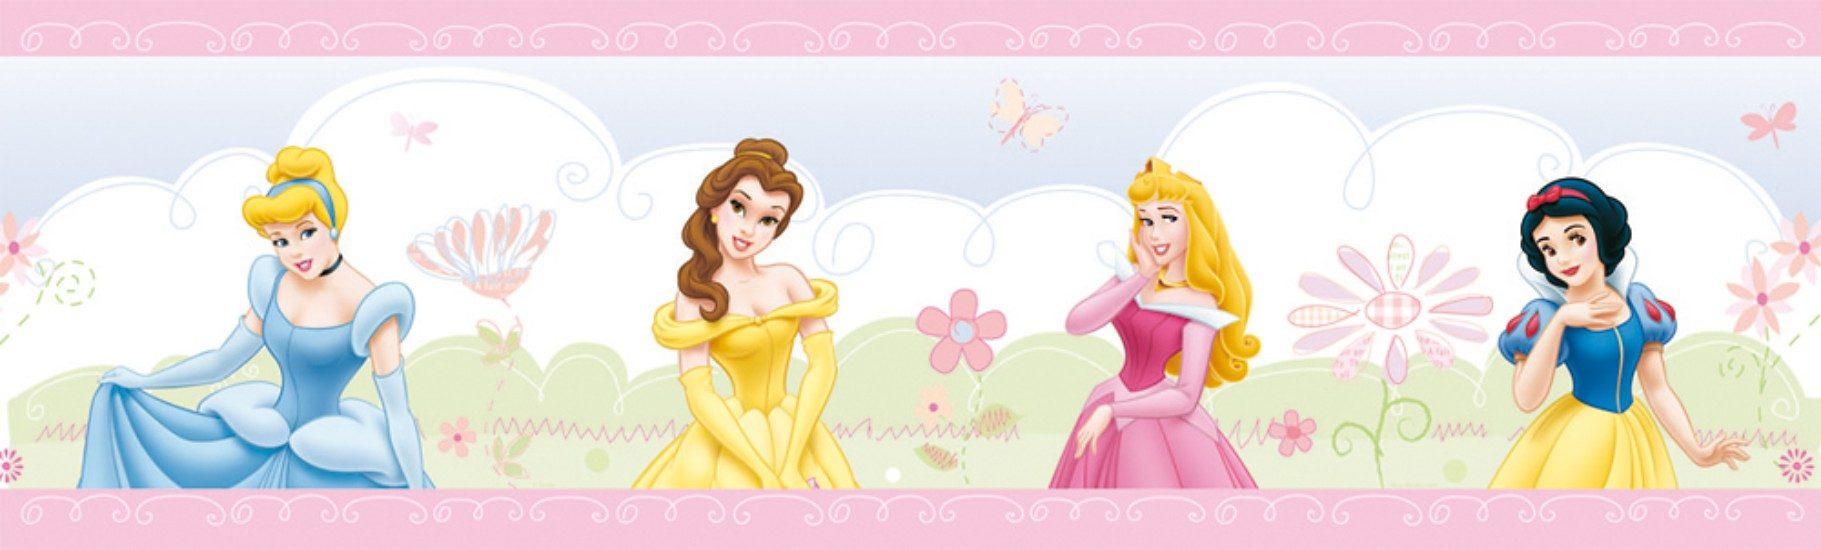 Decofun Bordüre Disney Princess Castle